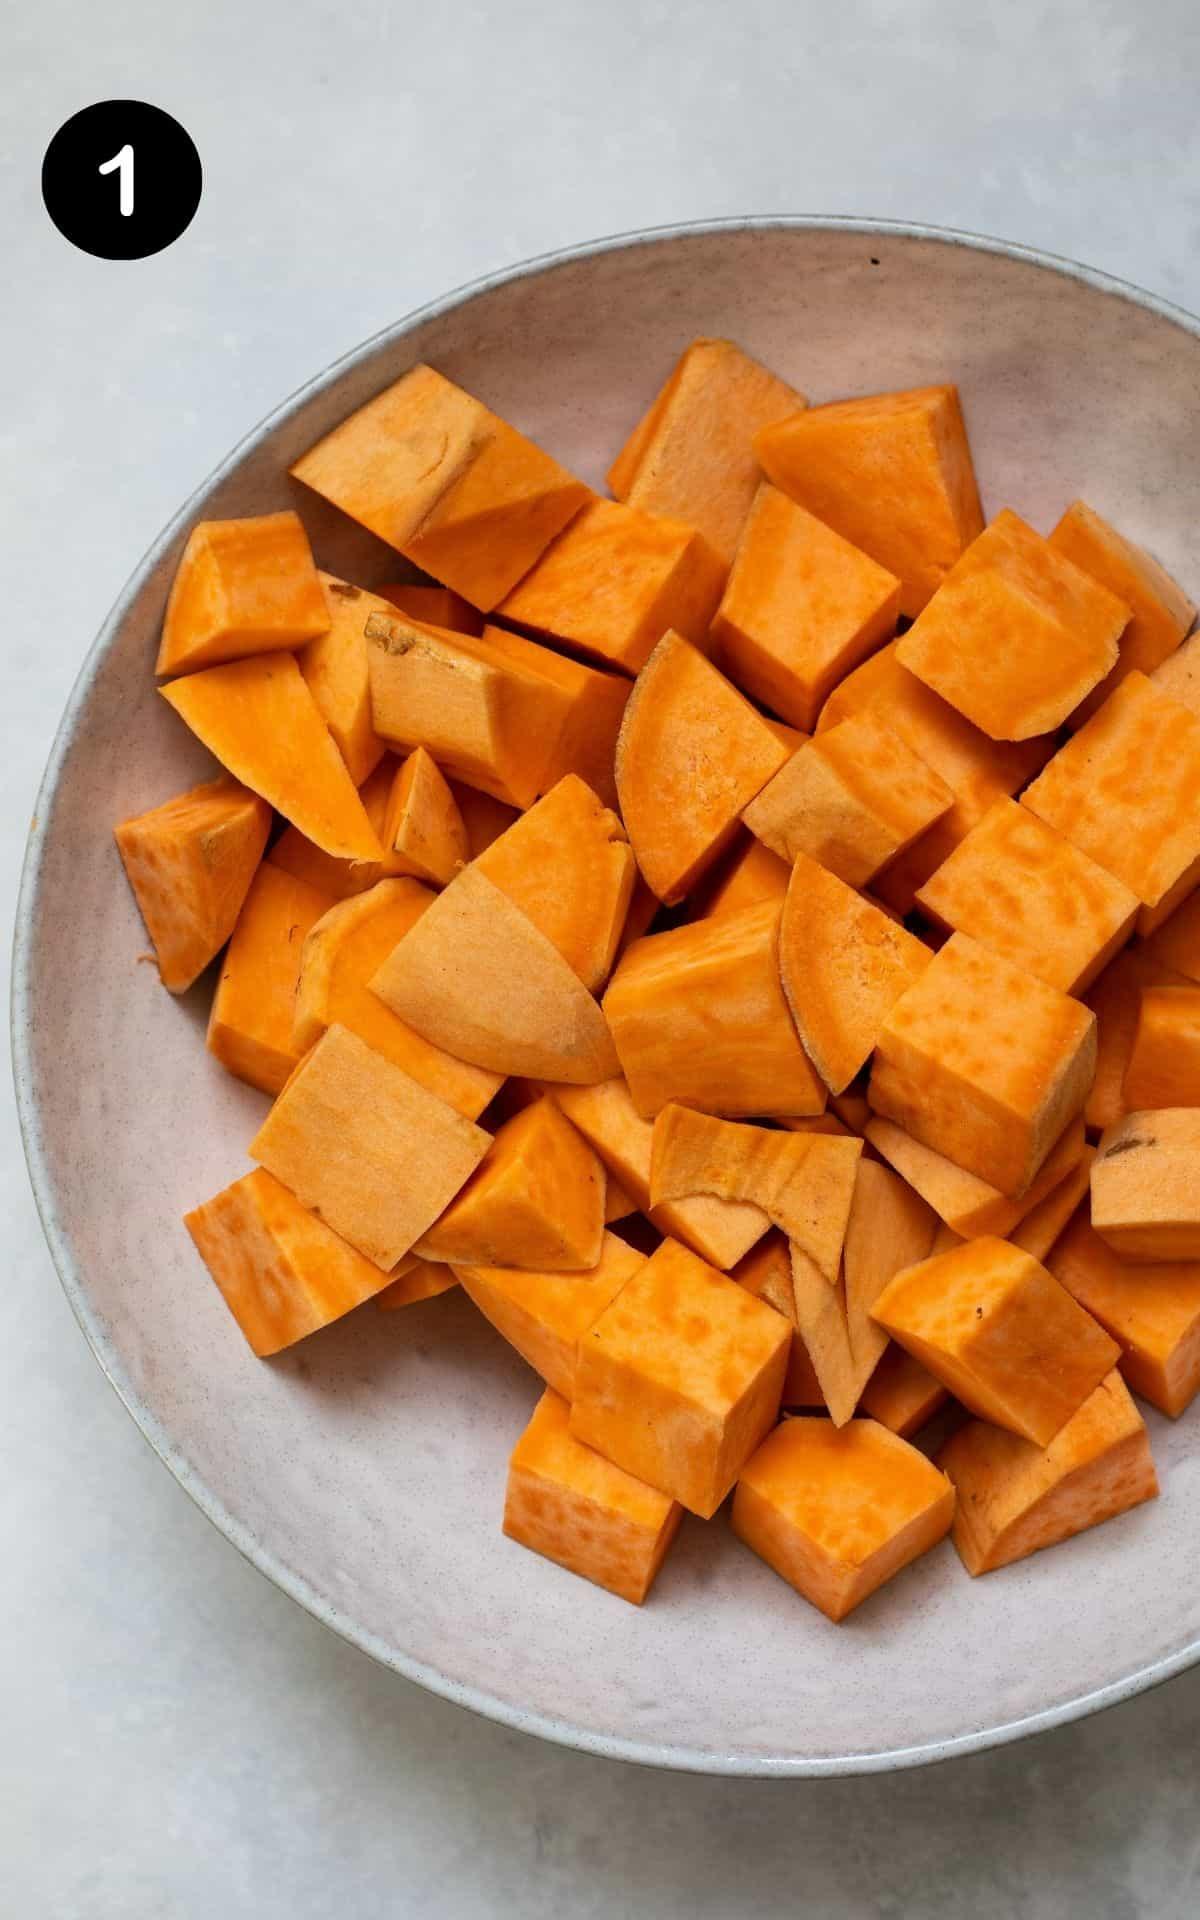 sweet potato peeled and chopped into cubes